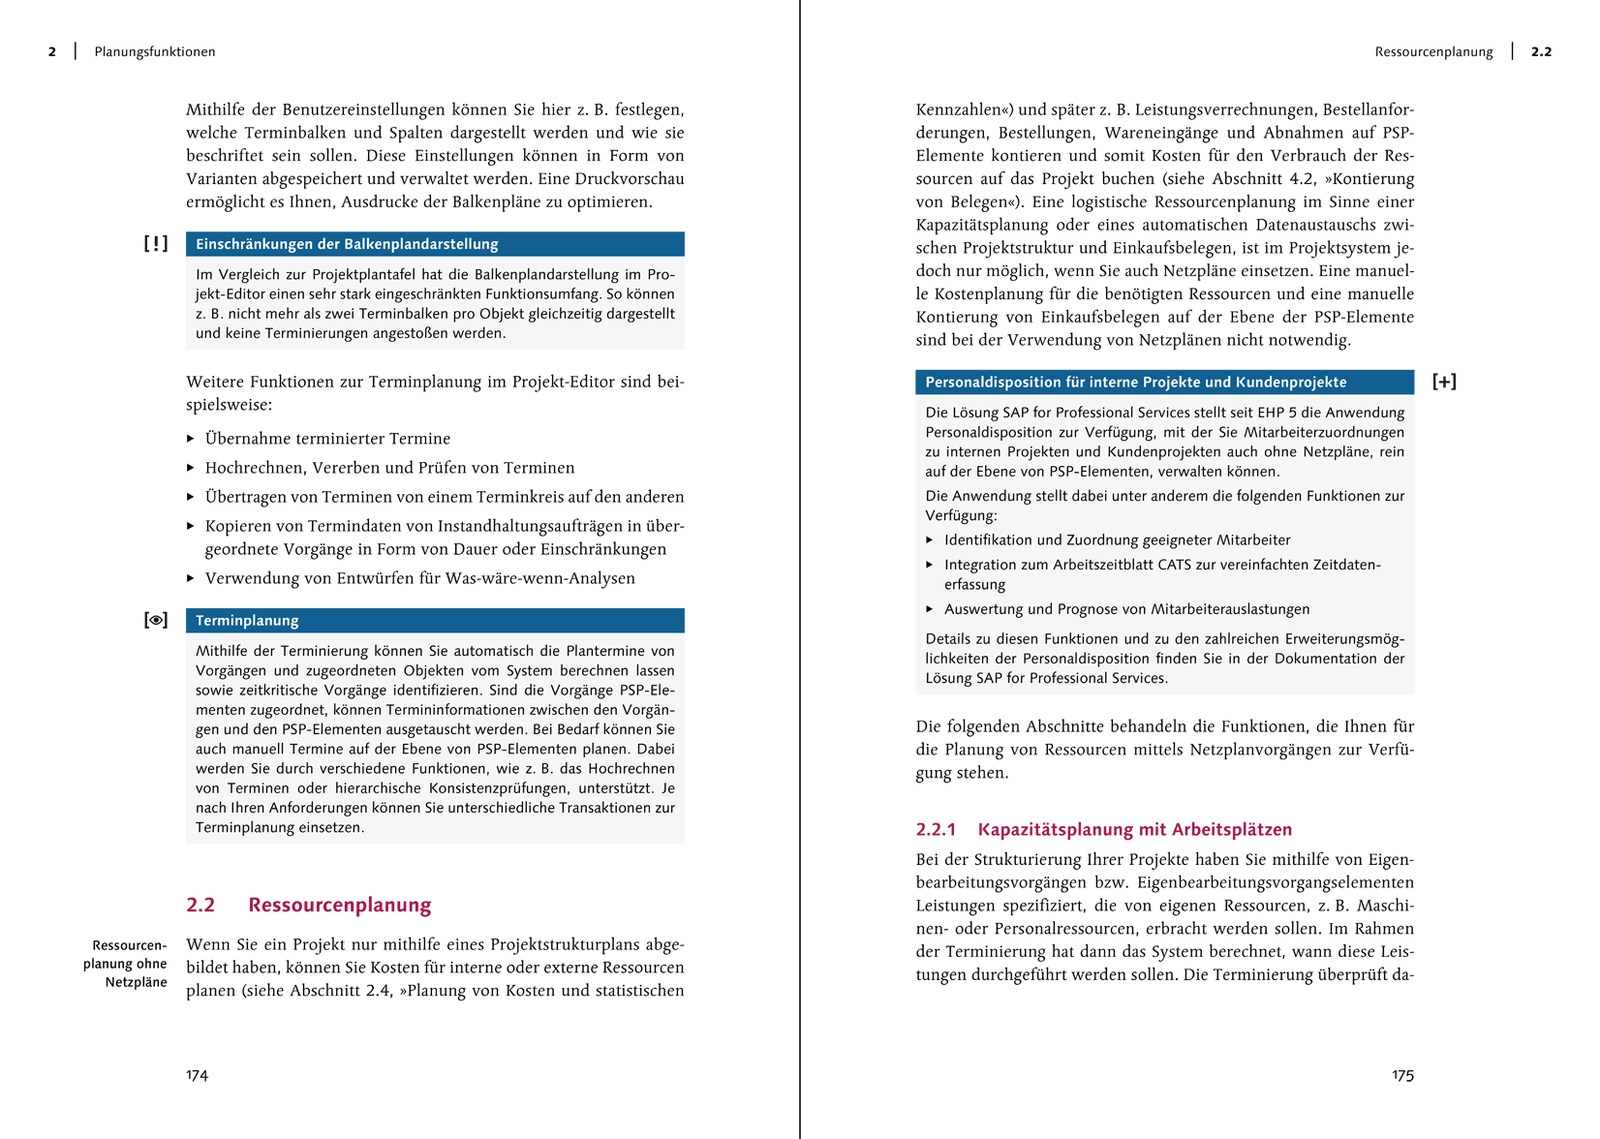 Projektmanagement mit SAP Projektsystem von Mario Franz (SAP PRESS)